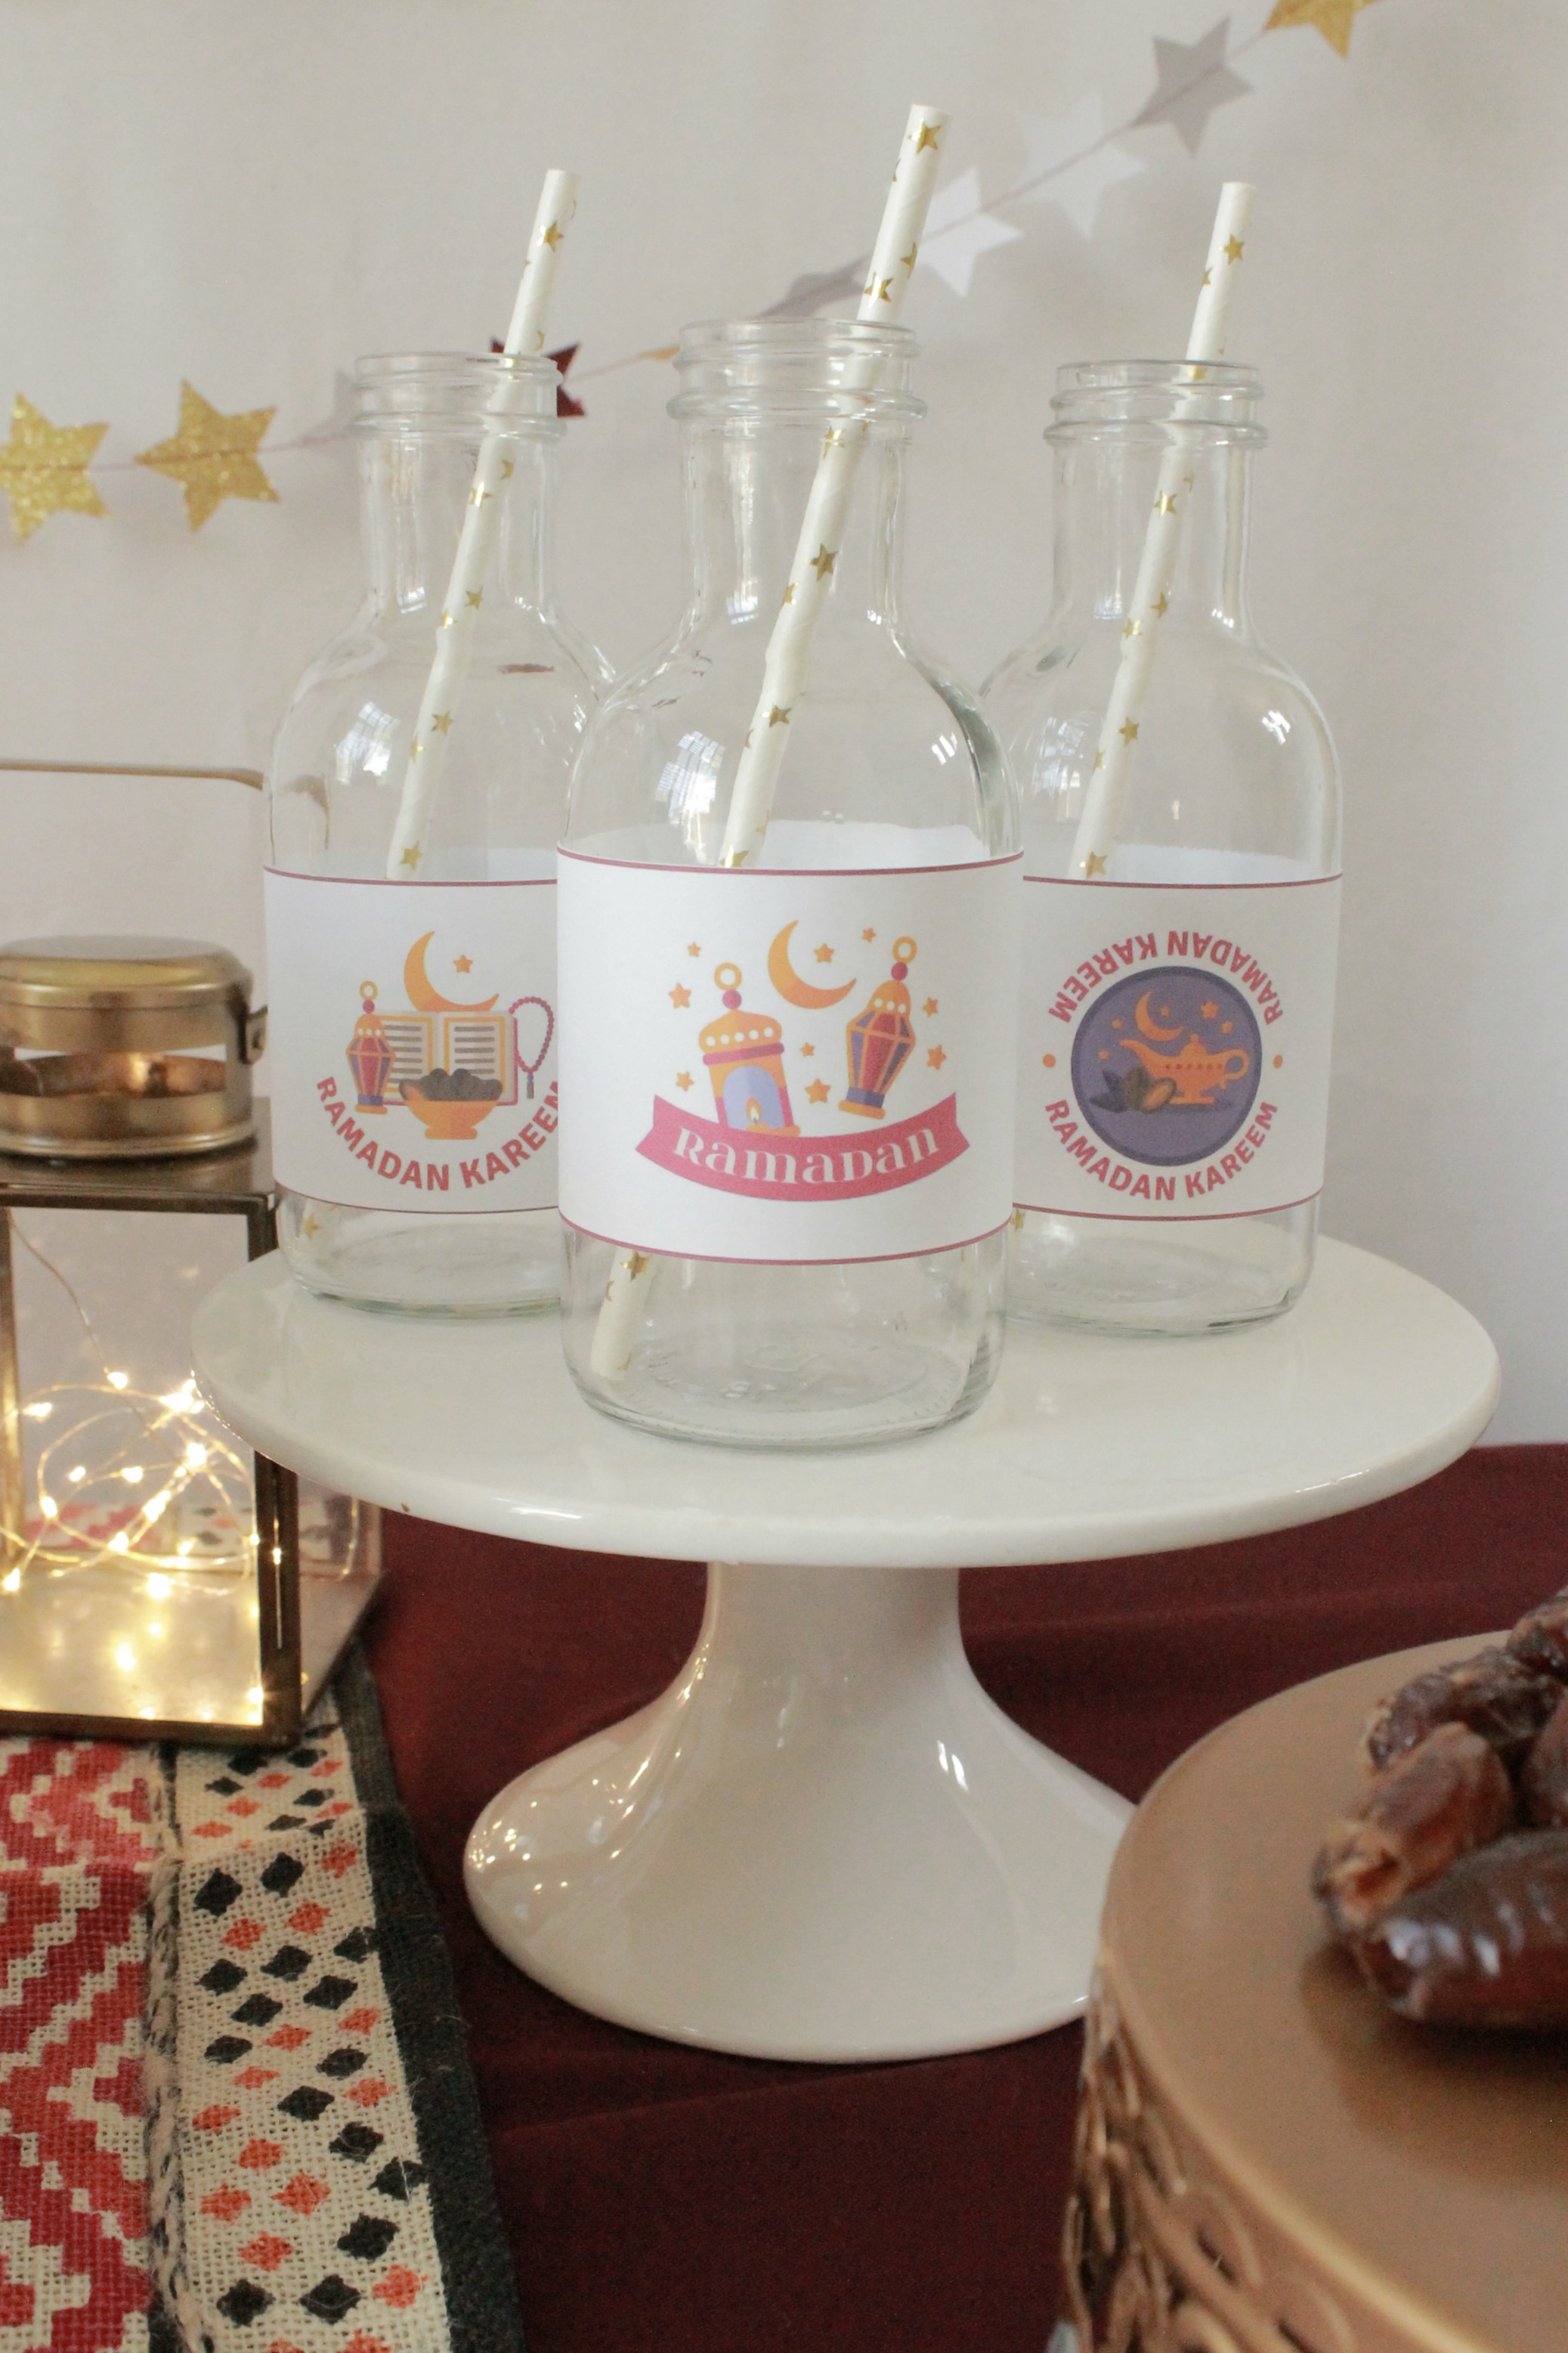 bottle labels-ramandan-www.sugarpartiesla.com.jpg